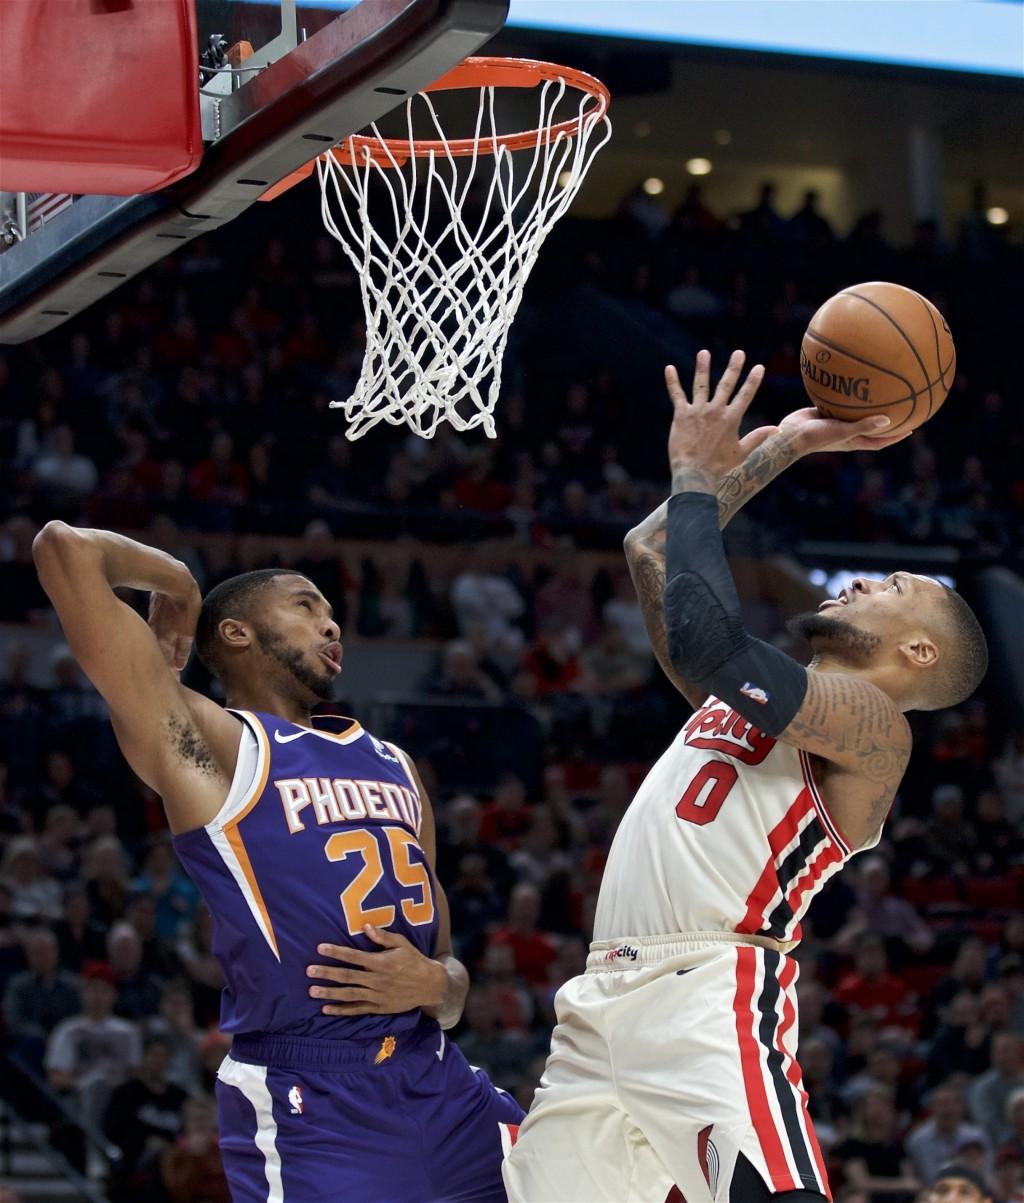 Portland Trail Blazers guard Damian Lillard, right, shoots over Phoenix Suns forward Mikal Bridges during the second half of an NBA basketball game in...